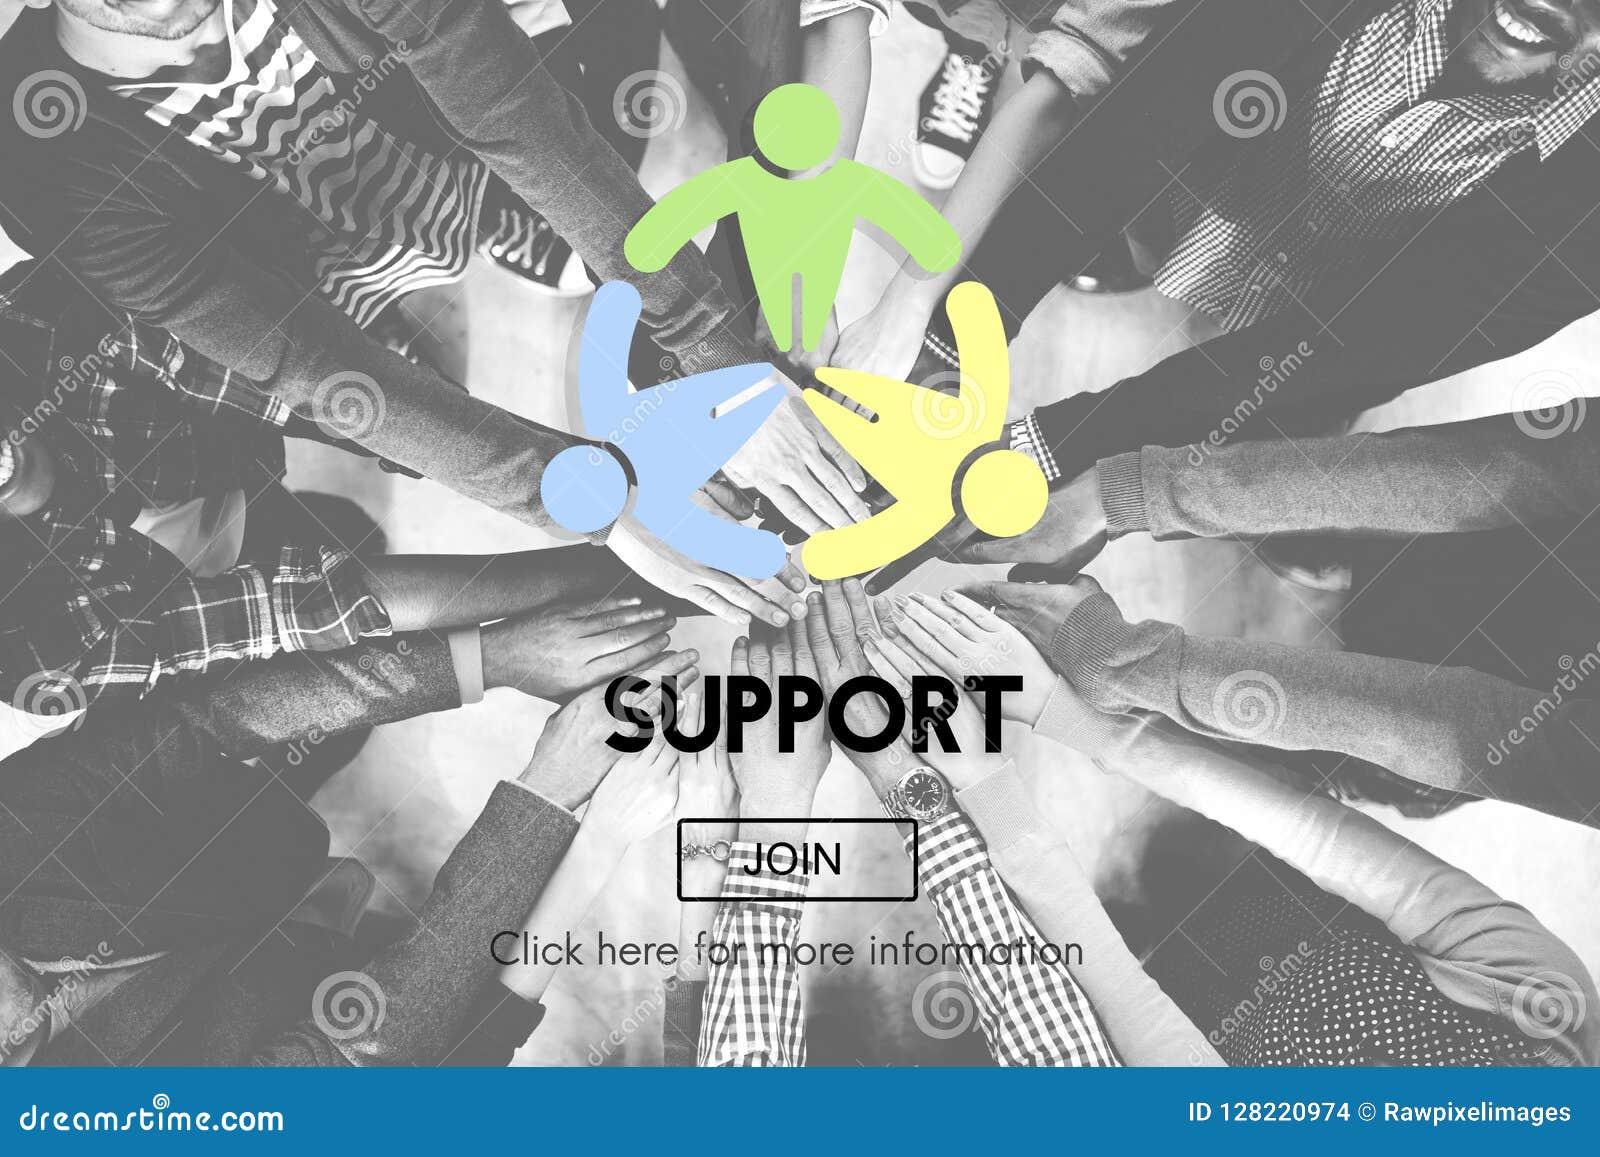 Support Collaboration Assistance Help Motivation Concept